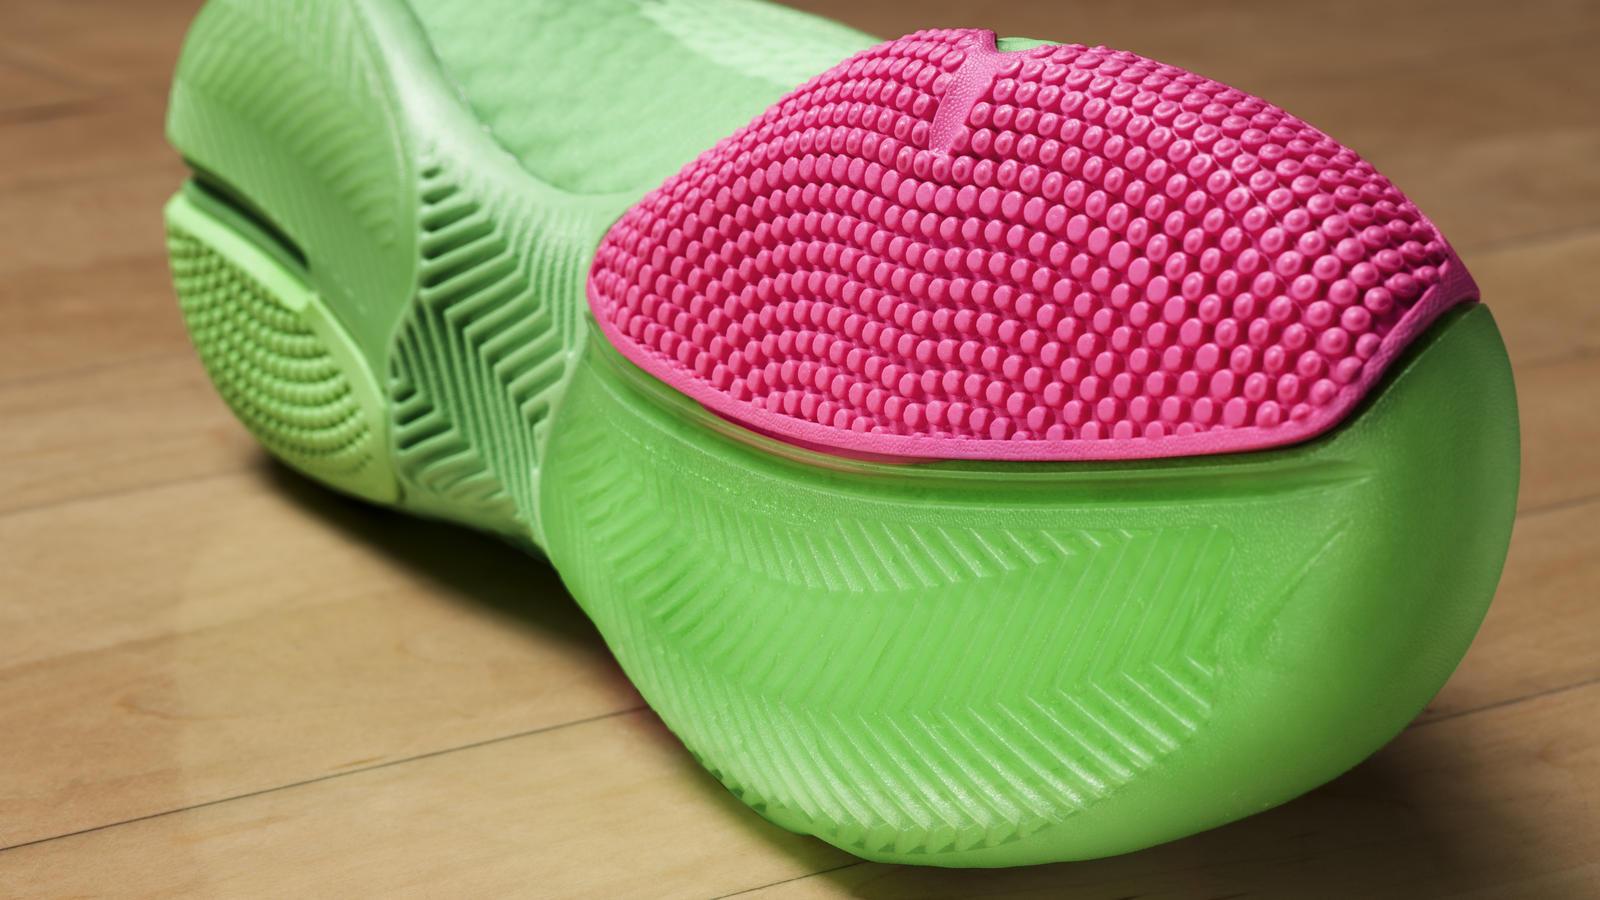 Nike Elastico Finale Ii Detail Outsole